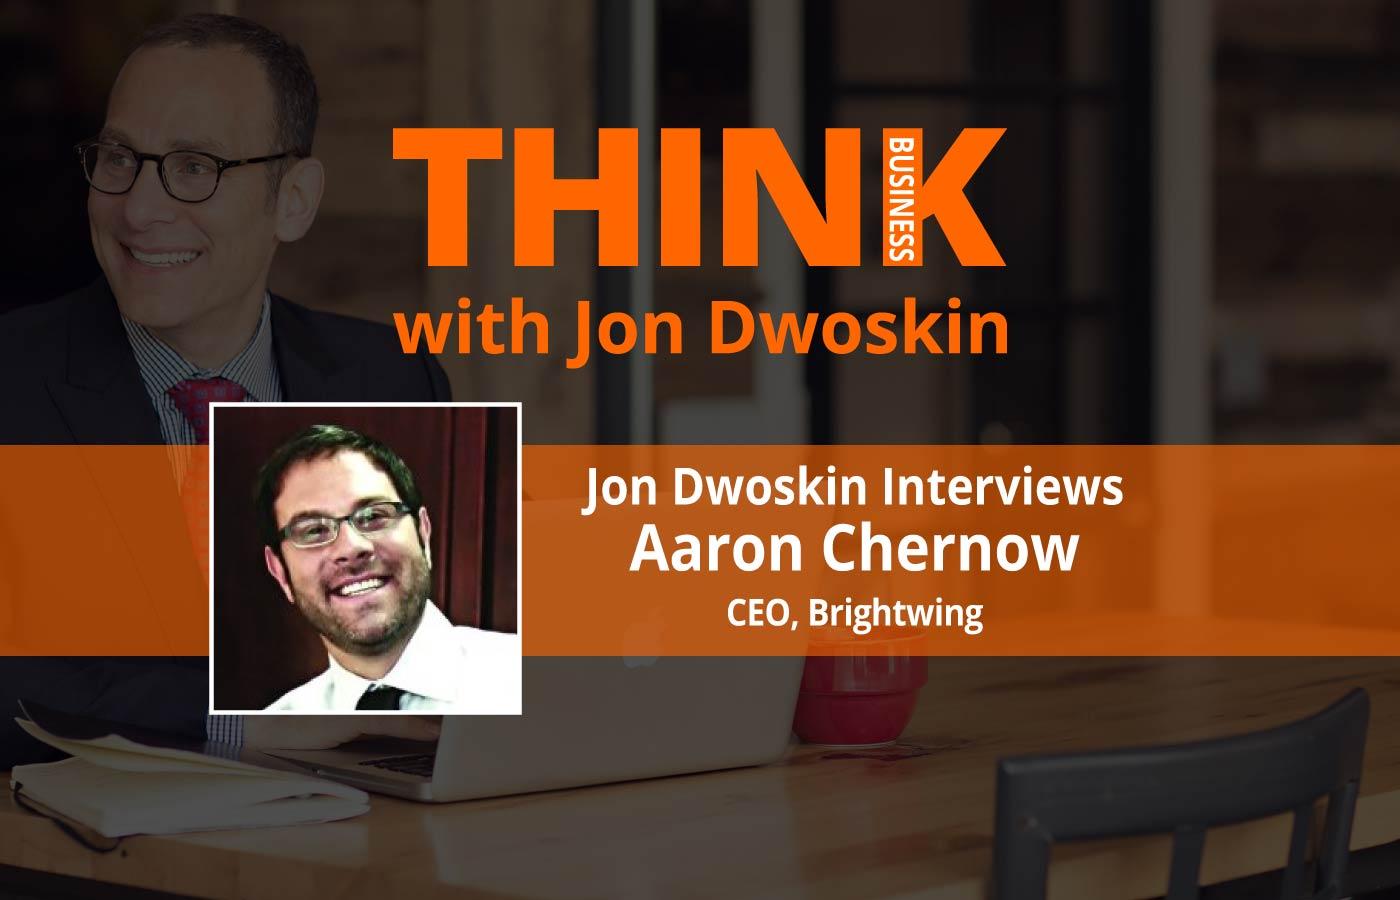 THINK Business: Jon Dwoskin Interviews Aaron Chernow, CEO, Brightwing